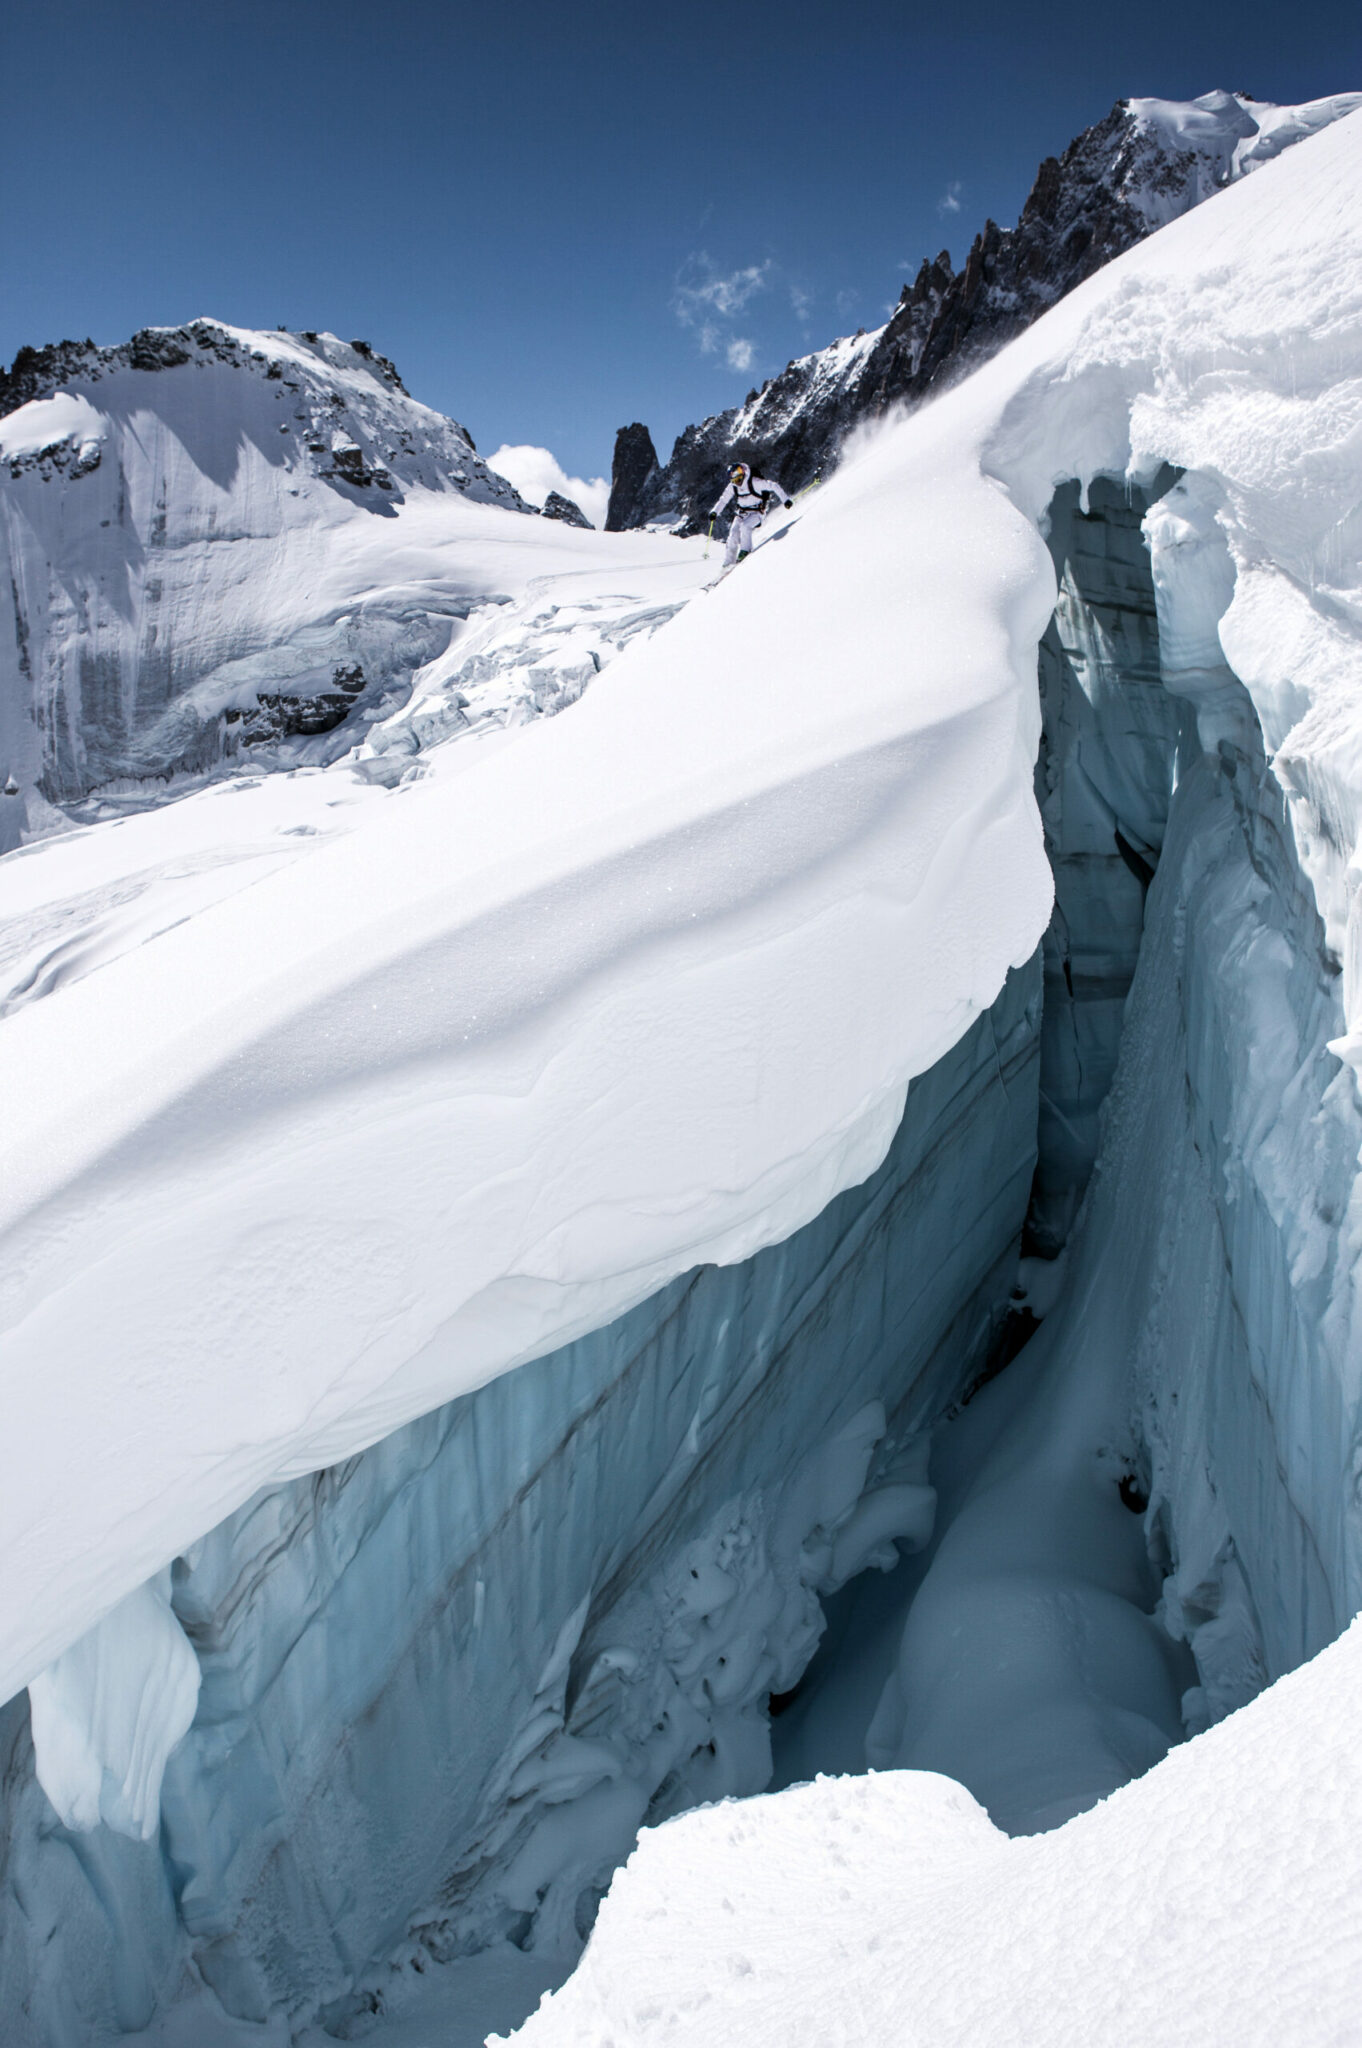 Skiing; Season 19/20; Chamonix; Mont-Blanc; Mer de Glace; Sota HS Jacket and Sota HS Pants, Nadine Wallner, Pro Team A thlete